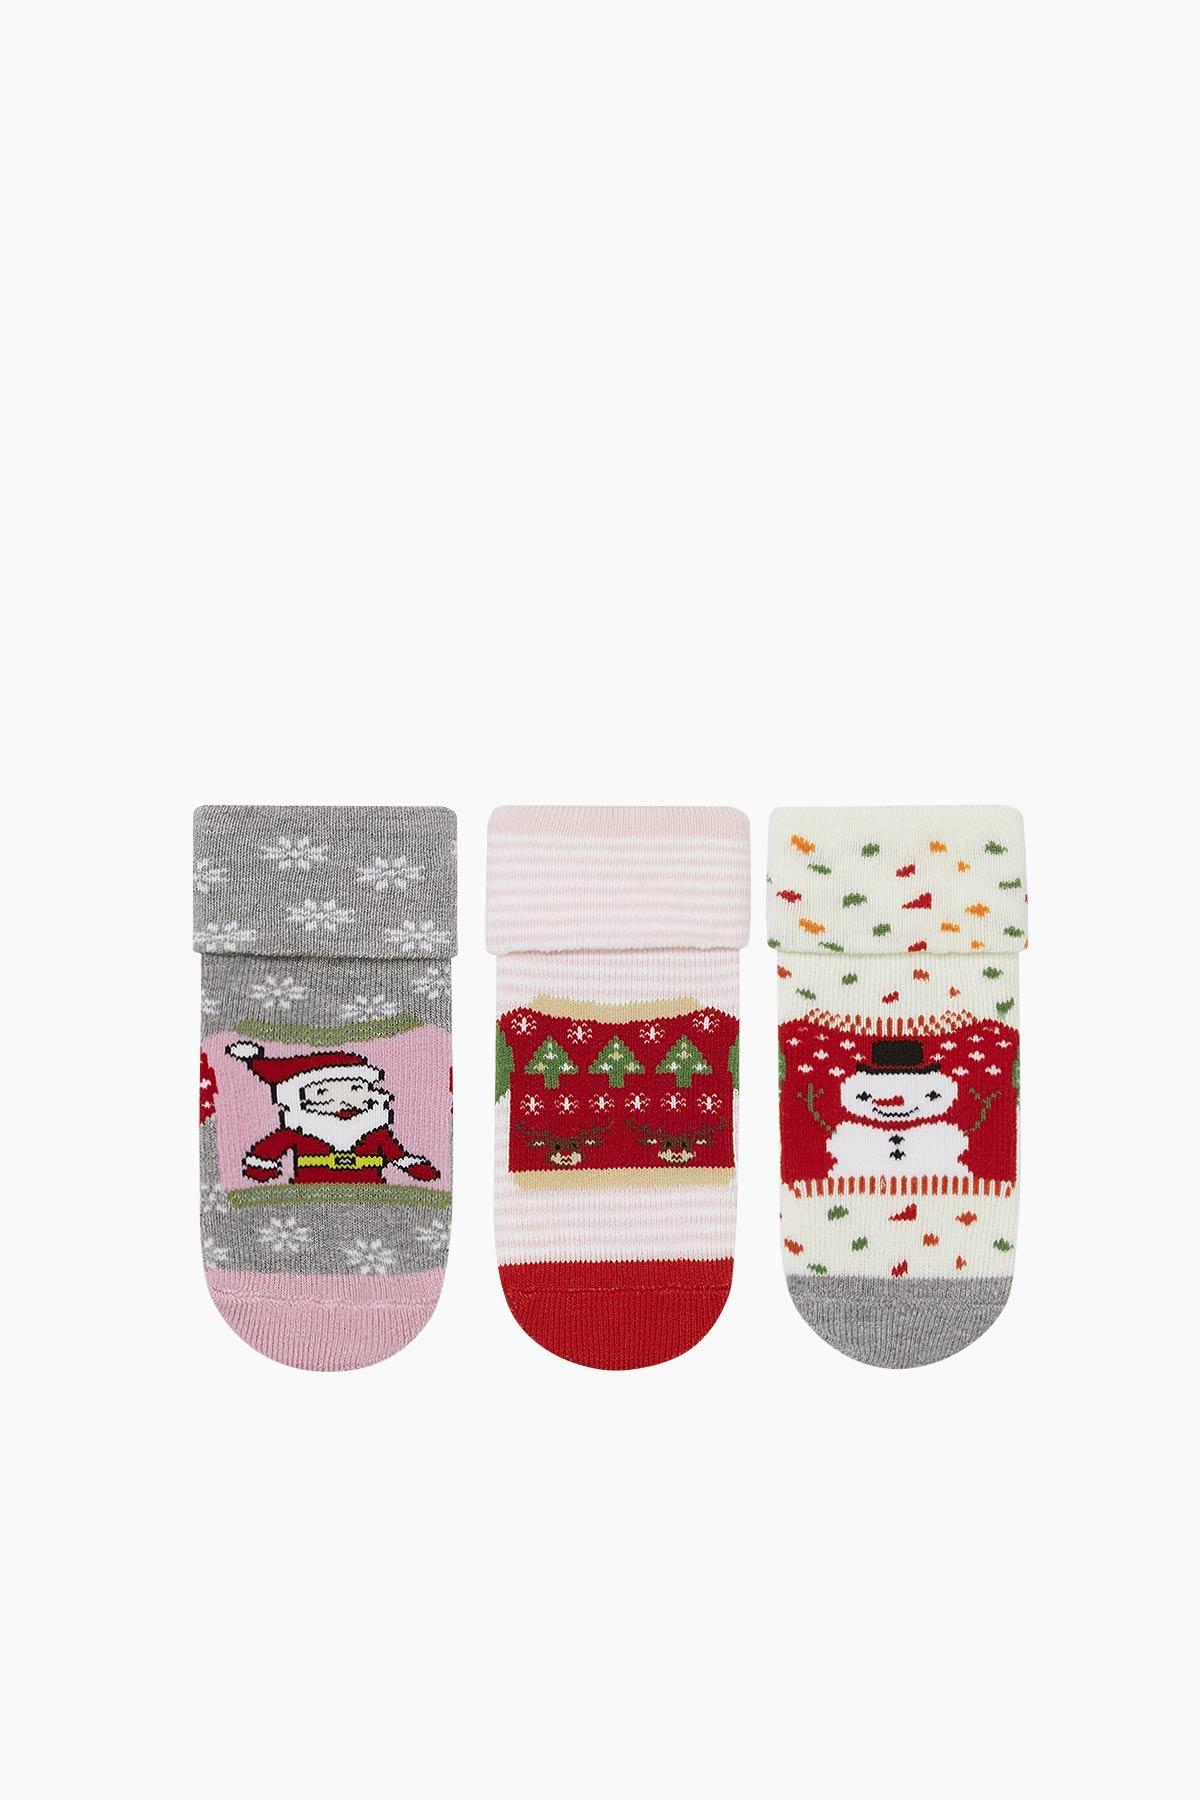 Bross - Bross 3-Piece Christmas Pattern Towel Baby Socks